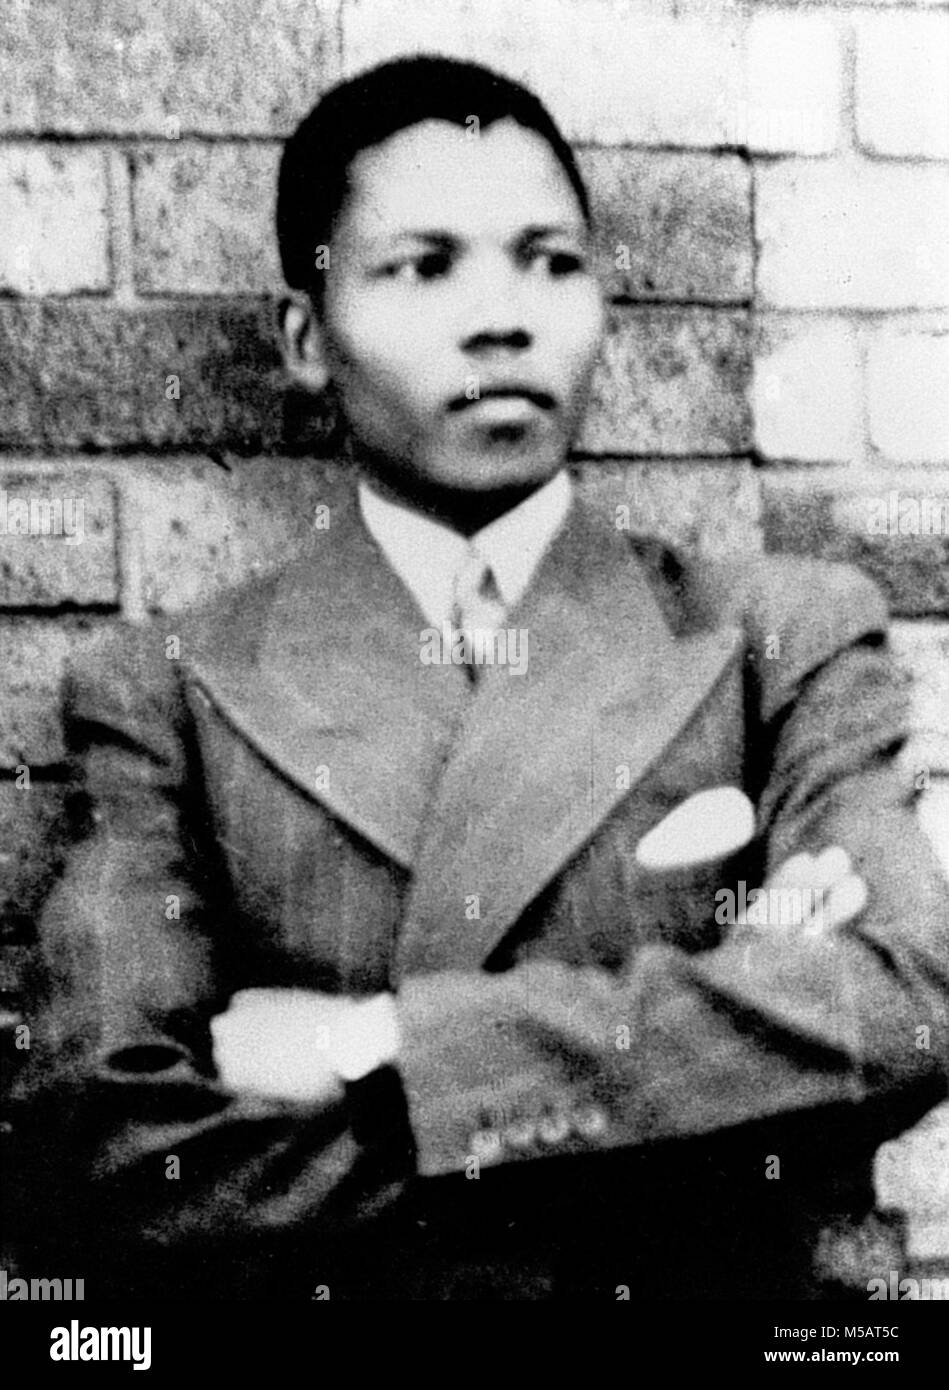 Mandela, taken in Umtata in 1937 Nelson Rolihlahla Mandela (1918 - 2013) South African anti-apartheid revolutionary - Stock Image